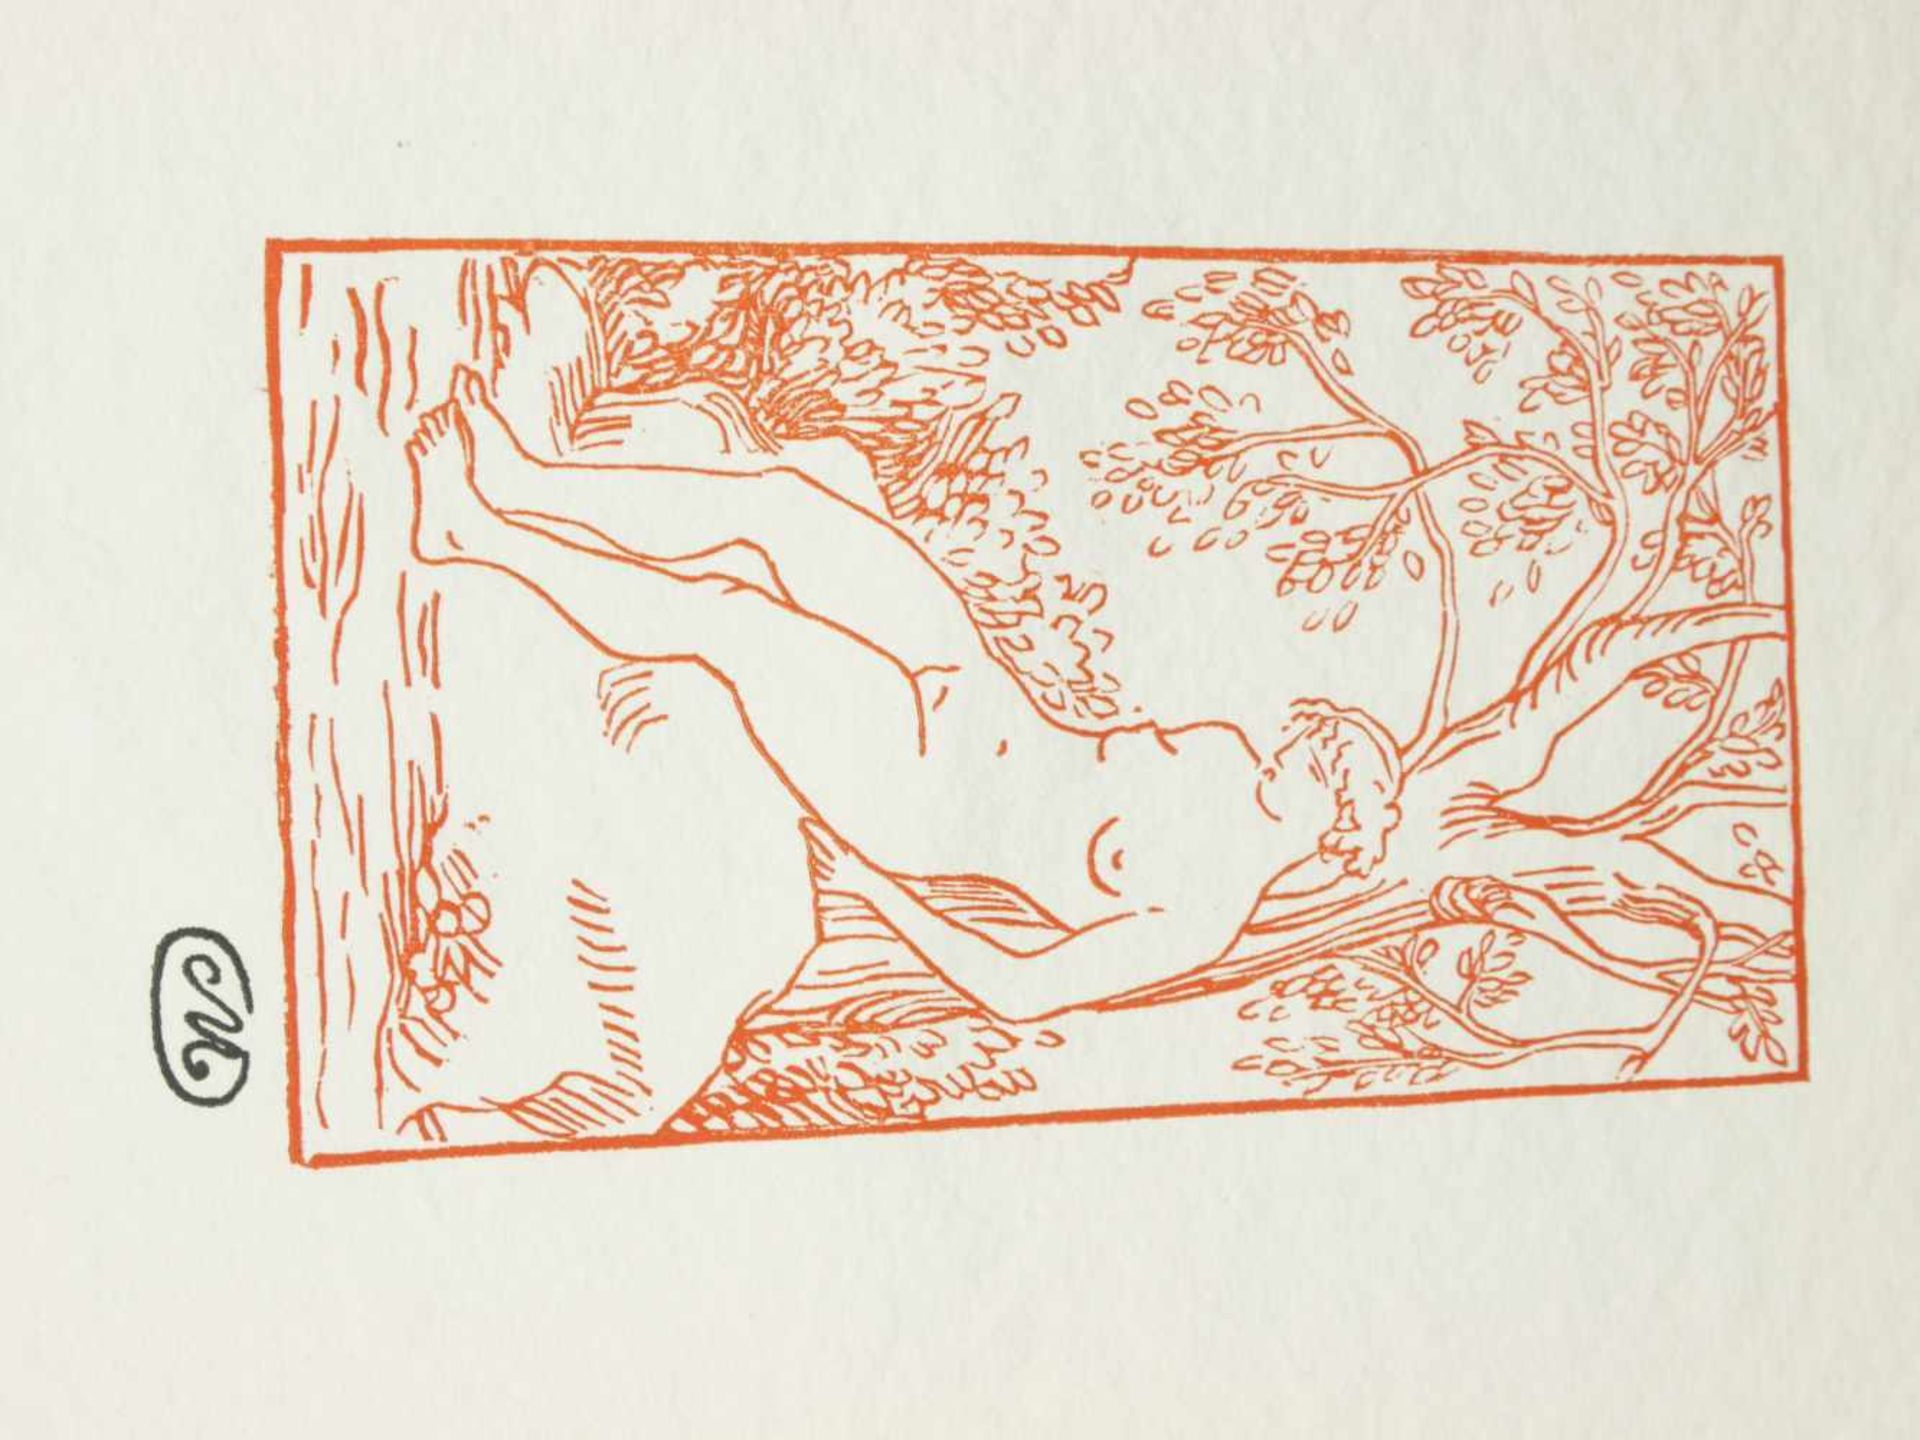 Los 17 - Maillol, Aristide (1861-1944) - Jungfrauen 1976 Euroart 127/2000Zwölf Original-holzschnitte zu